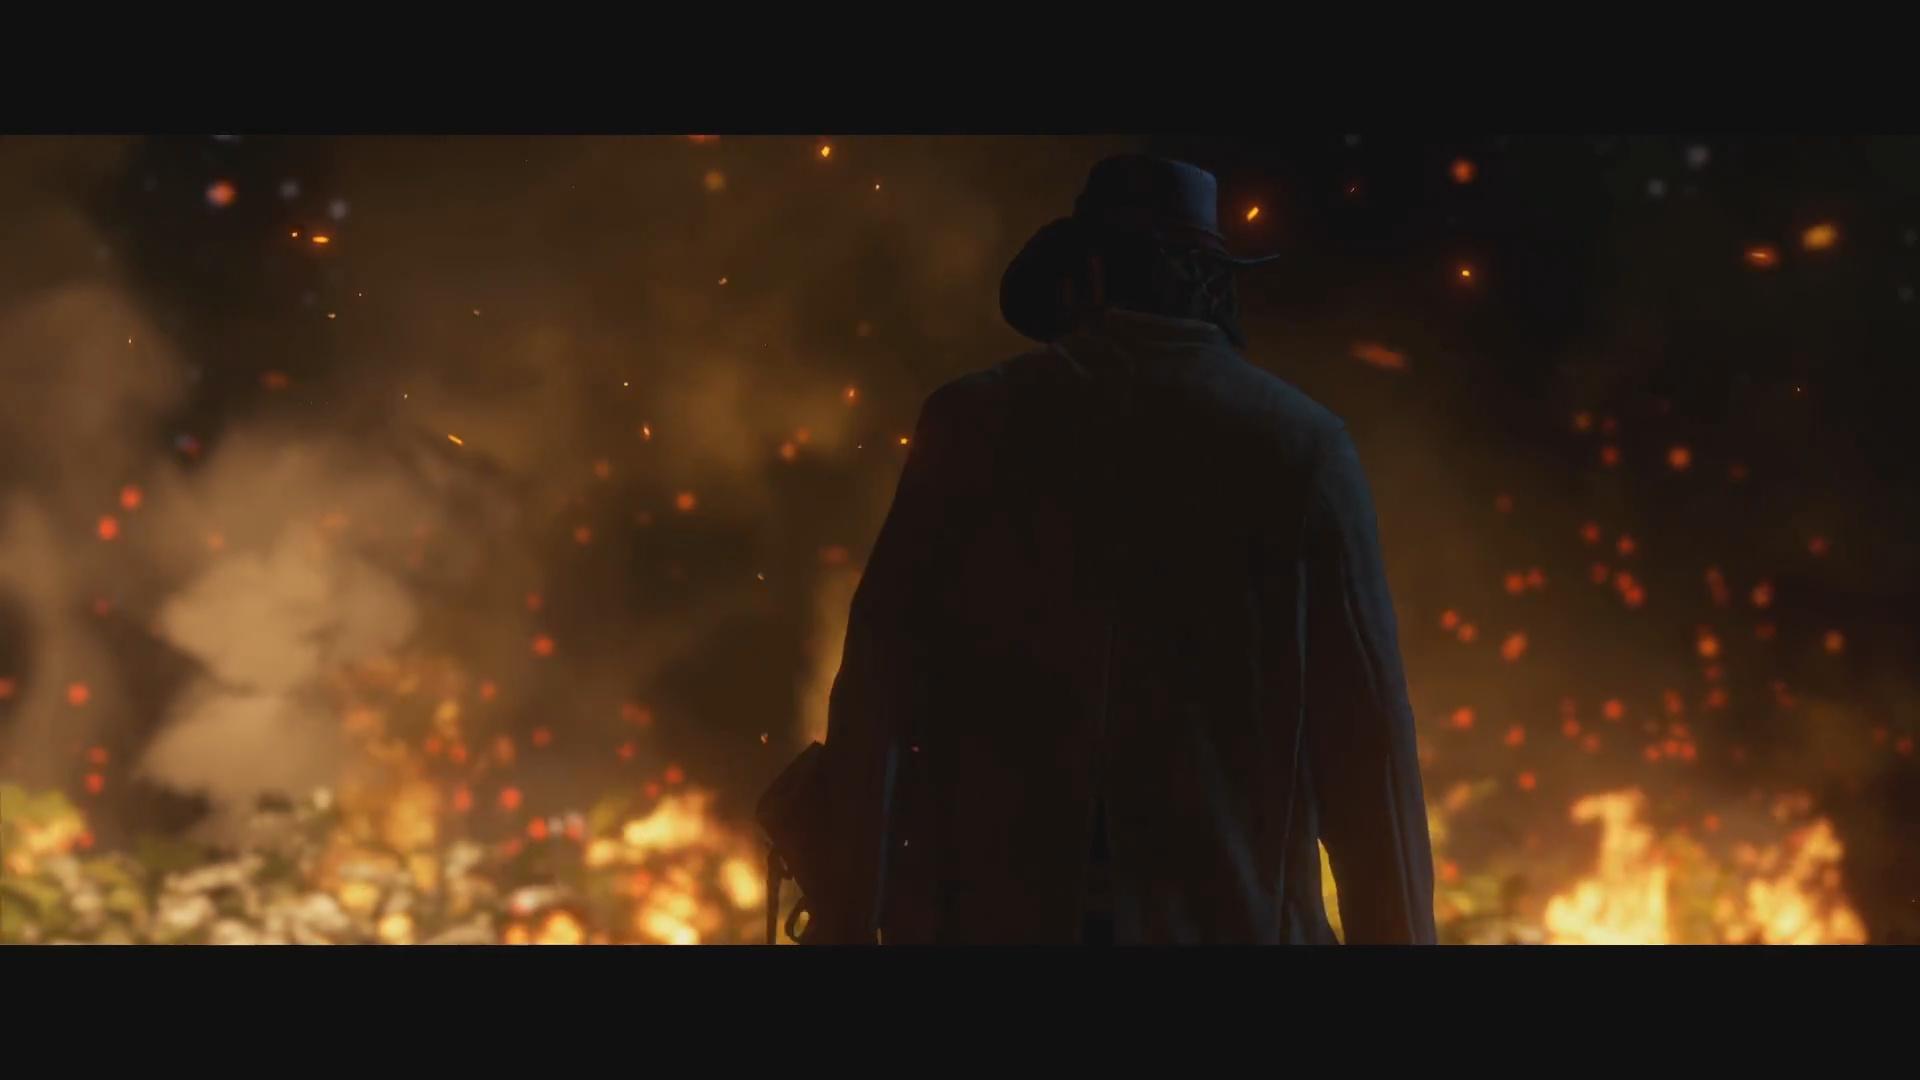 red dead redemption 2 سیستم مورد نیاز تصاویر حاصل از تریلر بازی Red Dead Redemption 2 تقدیم به ...